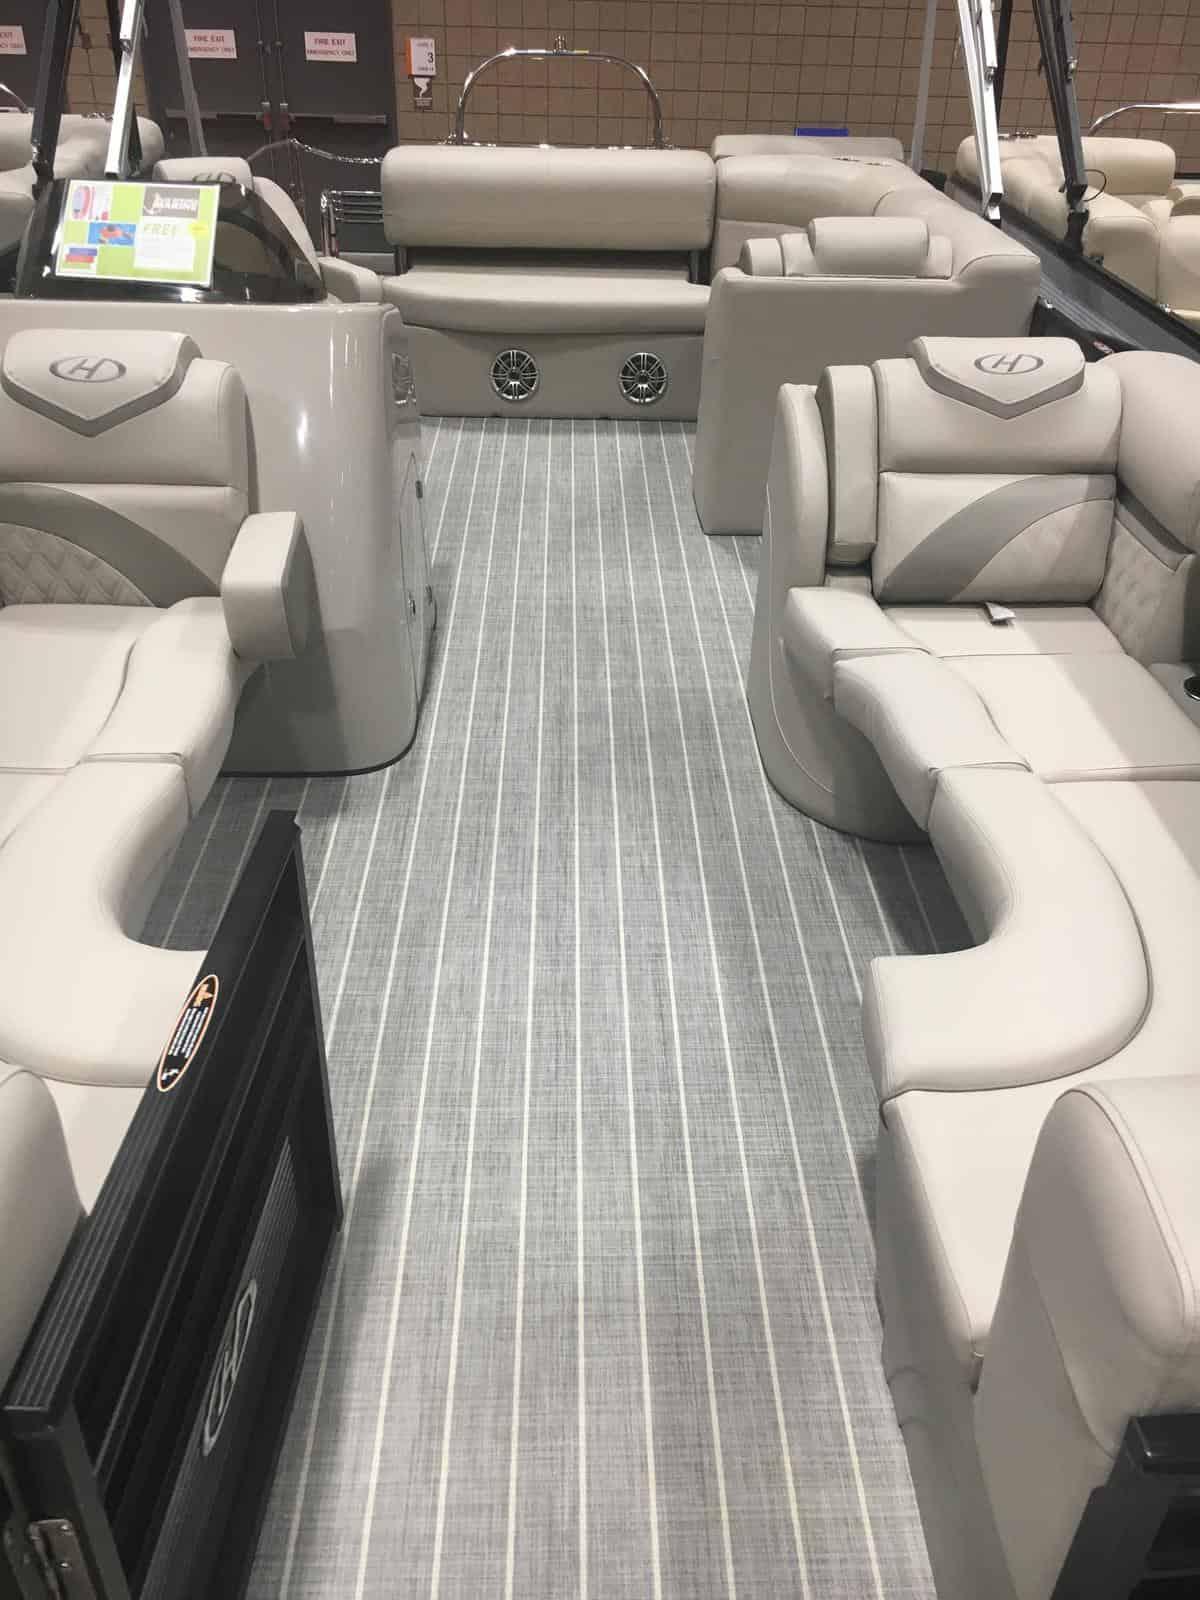 NEW 2018 HARRIS SUNLINER 220 SL .